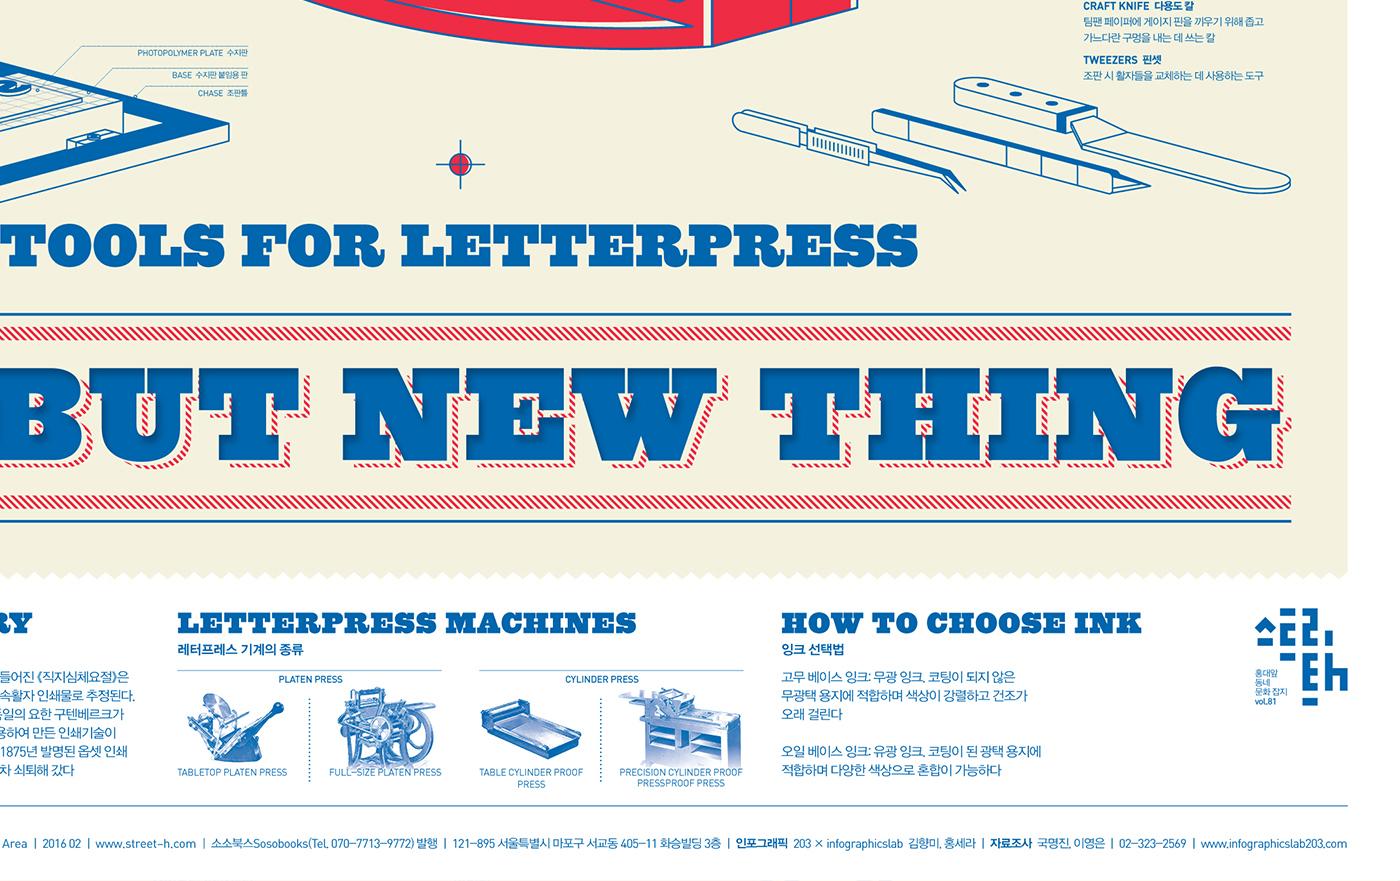 #Poster #Design #graphic design #infographic #infographics #data visualization #editorialdesign #book #letterpress #203x